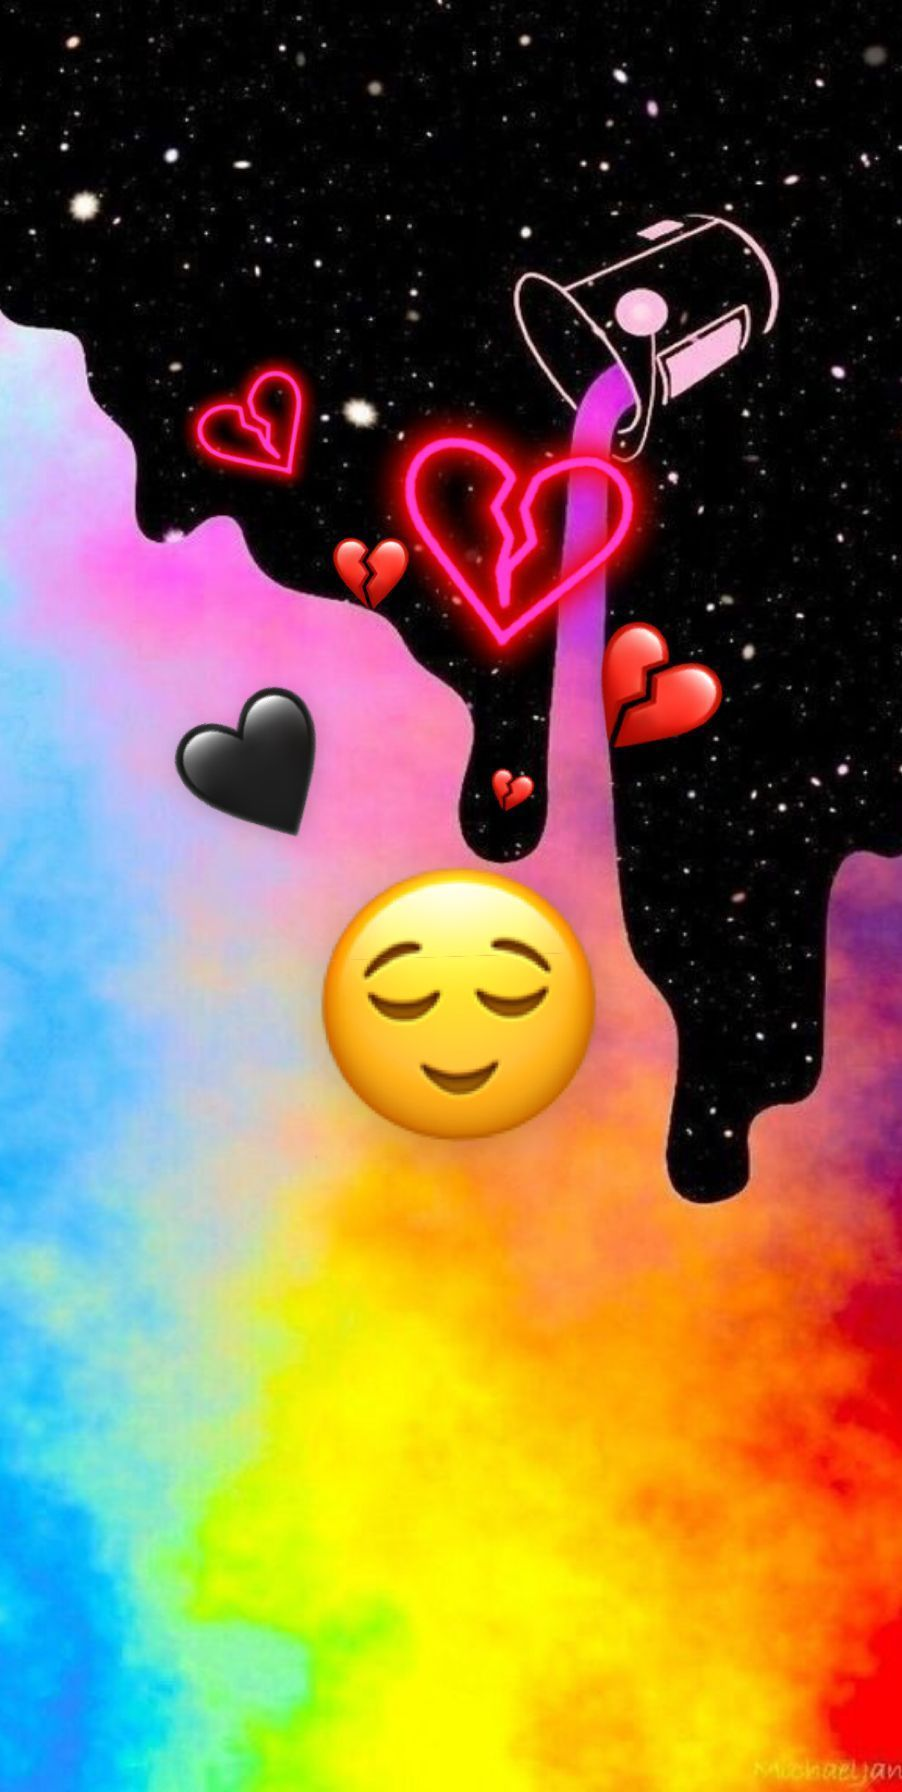 Love Hintergrund Iphone Cute Emoji Wallpaper Emoji Wallpaper Iphone Emoji Wallpaper